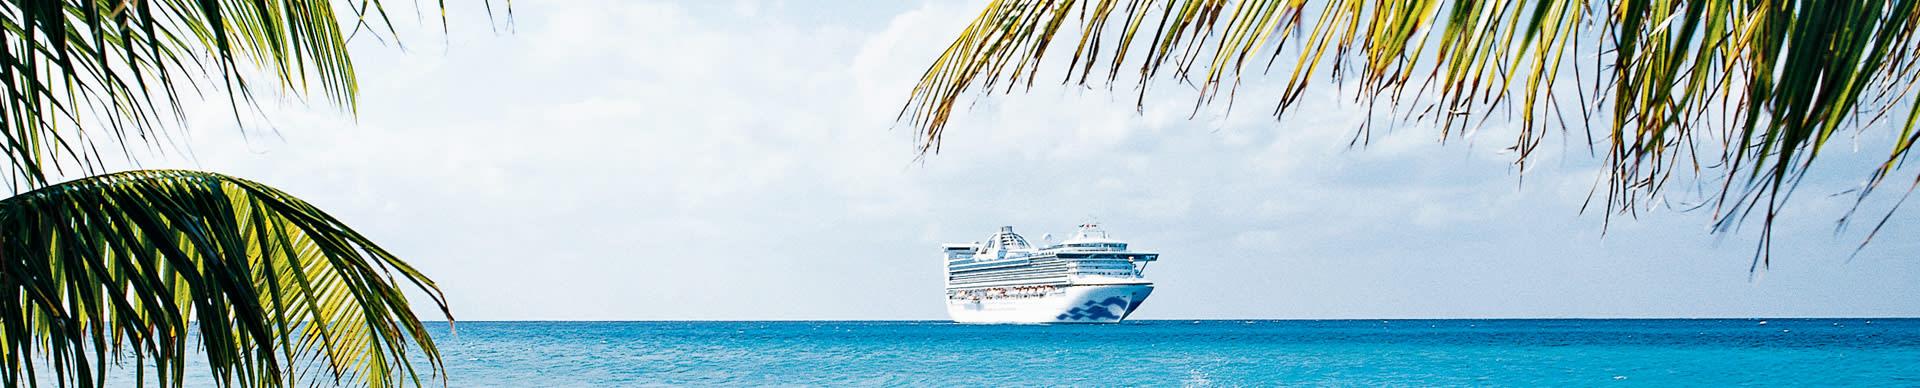 Princess Cruises Fall 2021 to Princess Cays